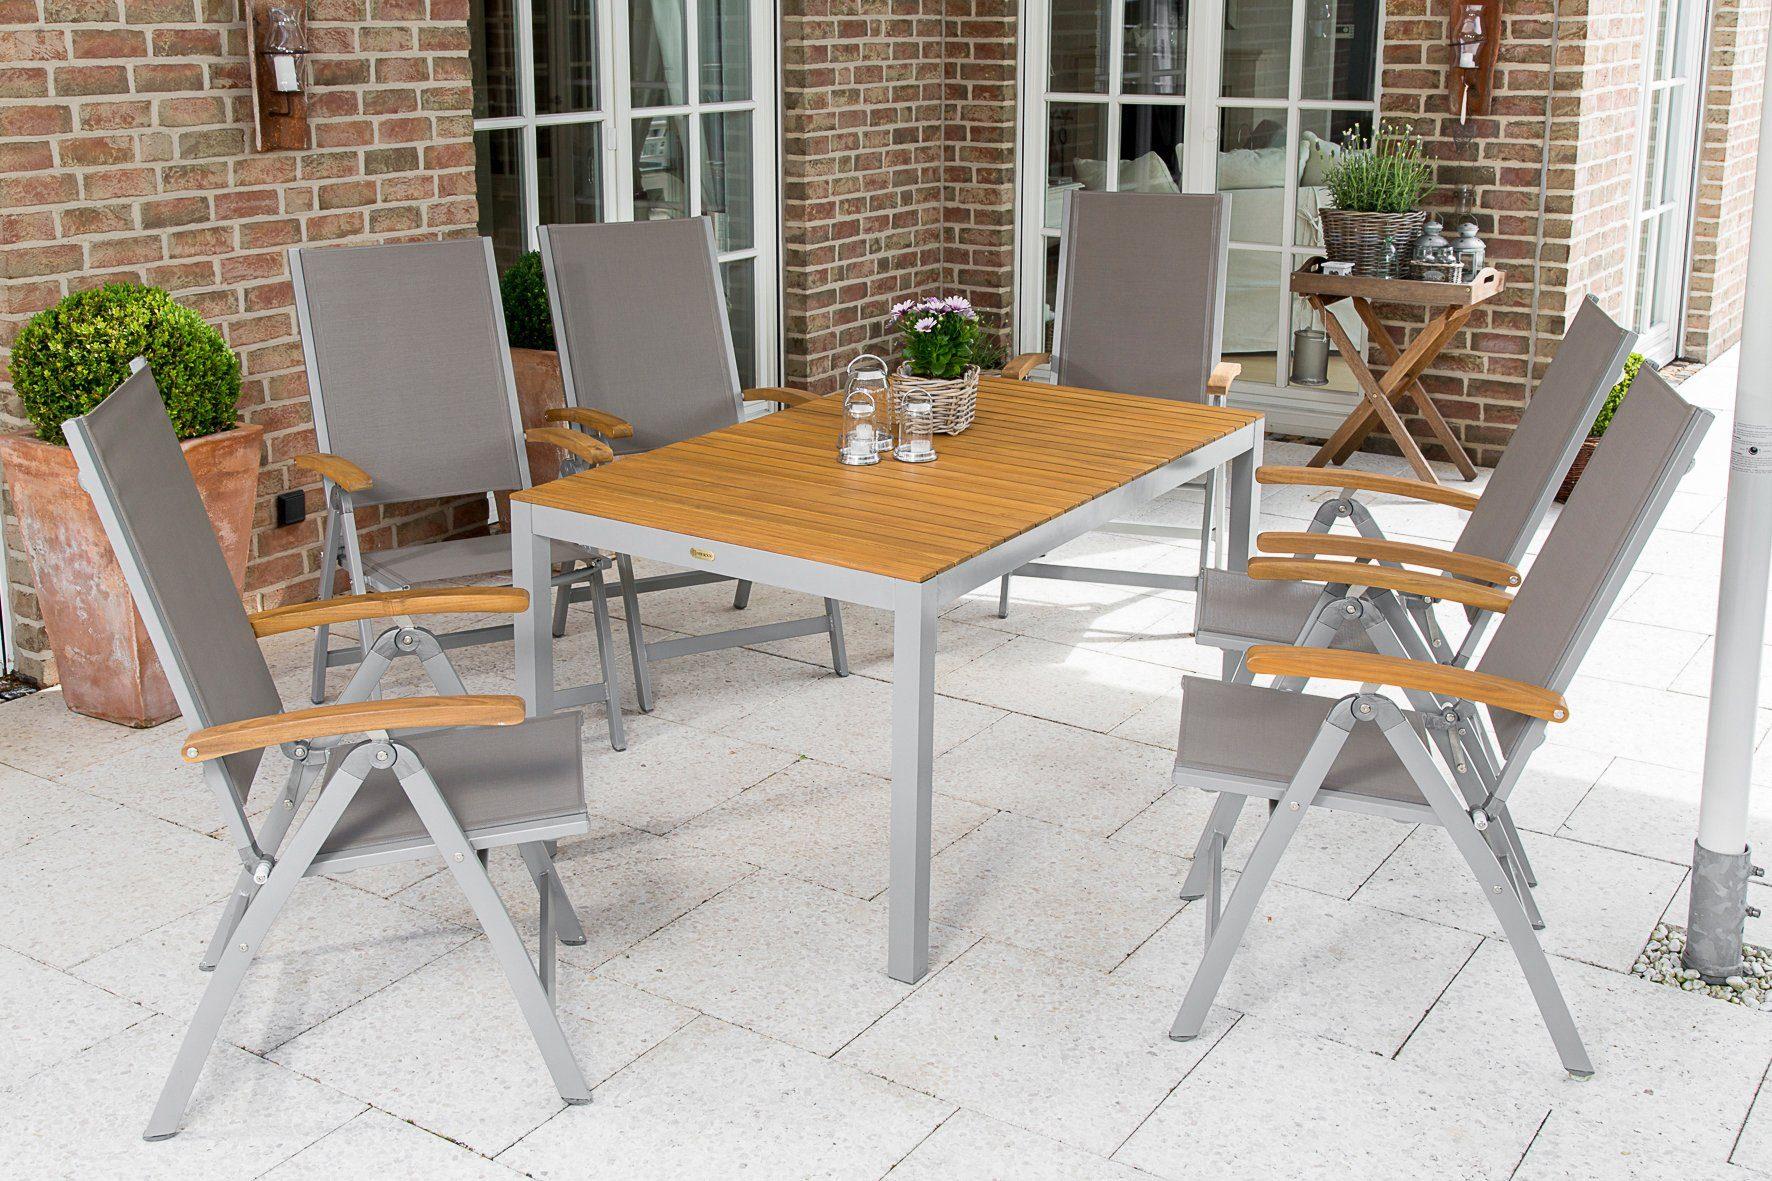 Holz Gartenmöbel Set Angebote ~ Gartenmöbel kunststoff gartenmobel plastik beste gartenmabel aus